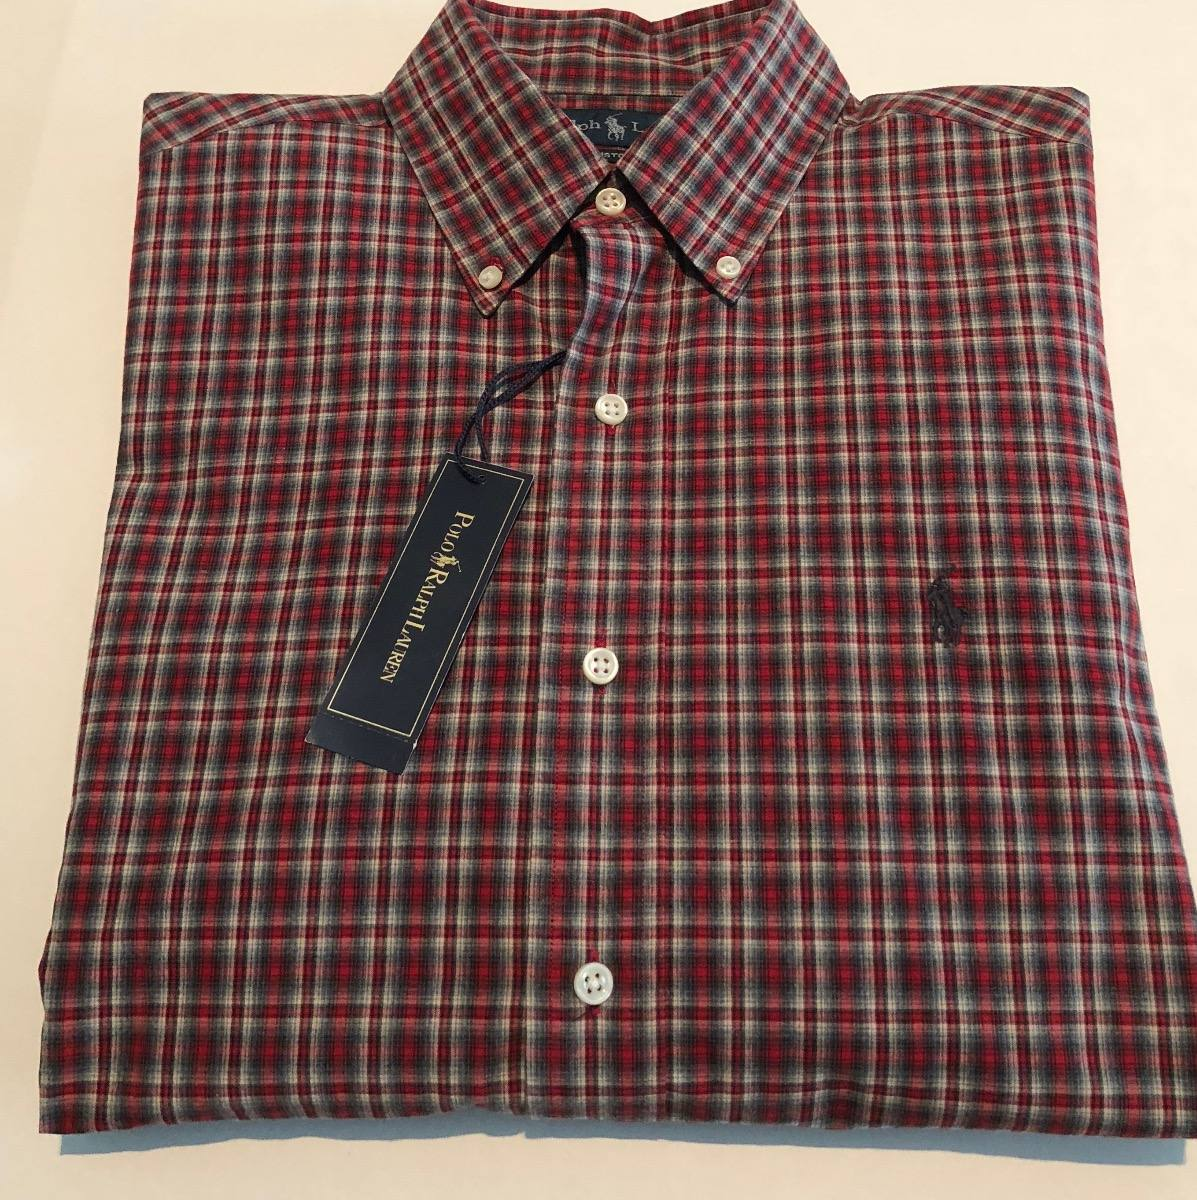 camisas leñadoras past season polo ralph lauren (70% off). Cargando zoom. ac107a6cdb1